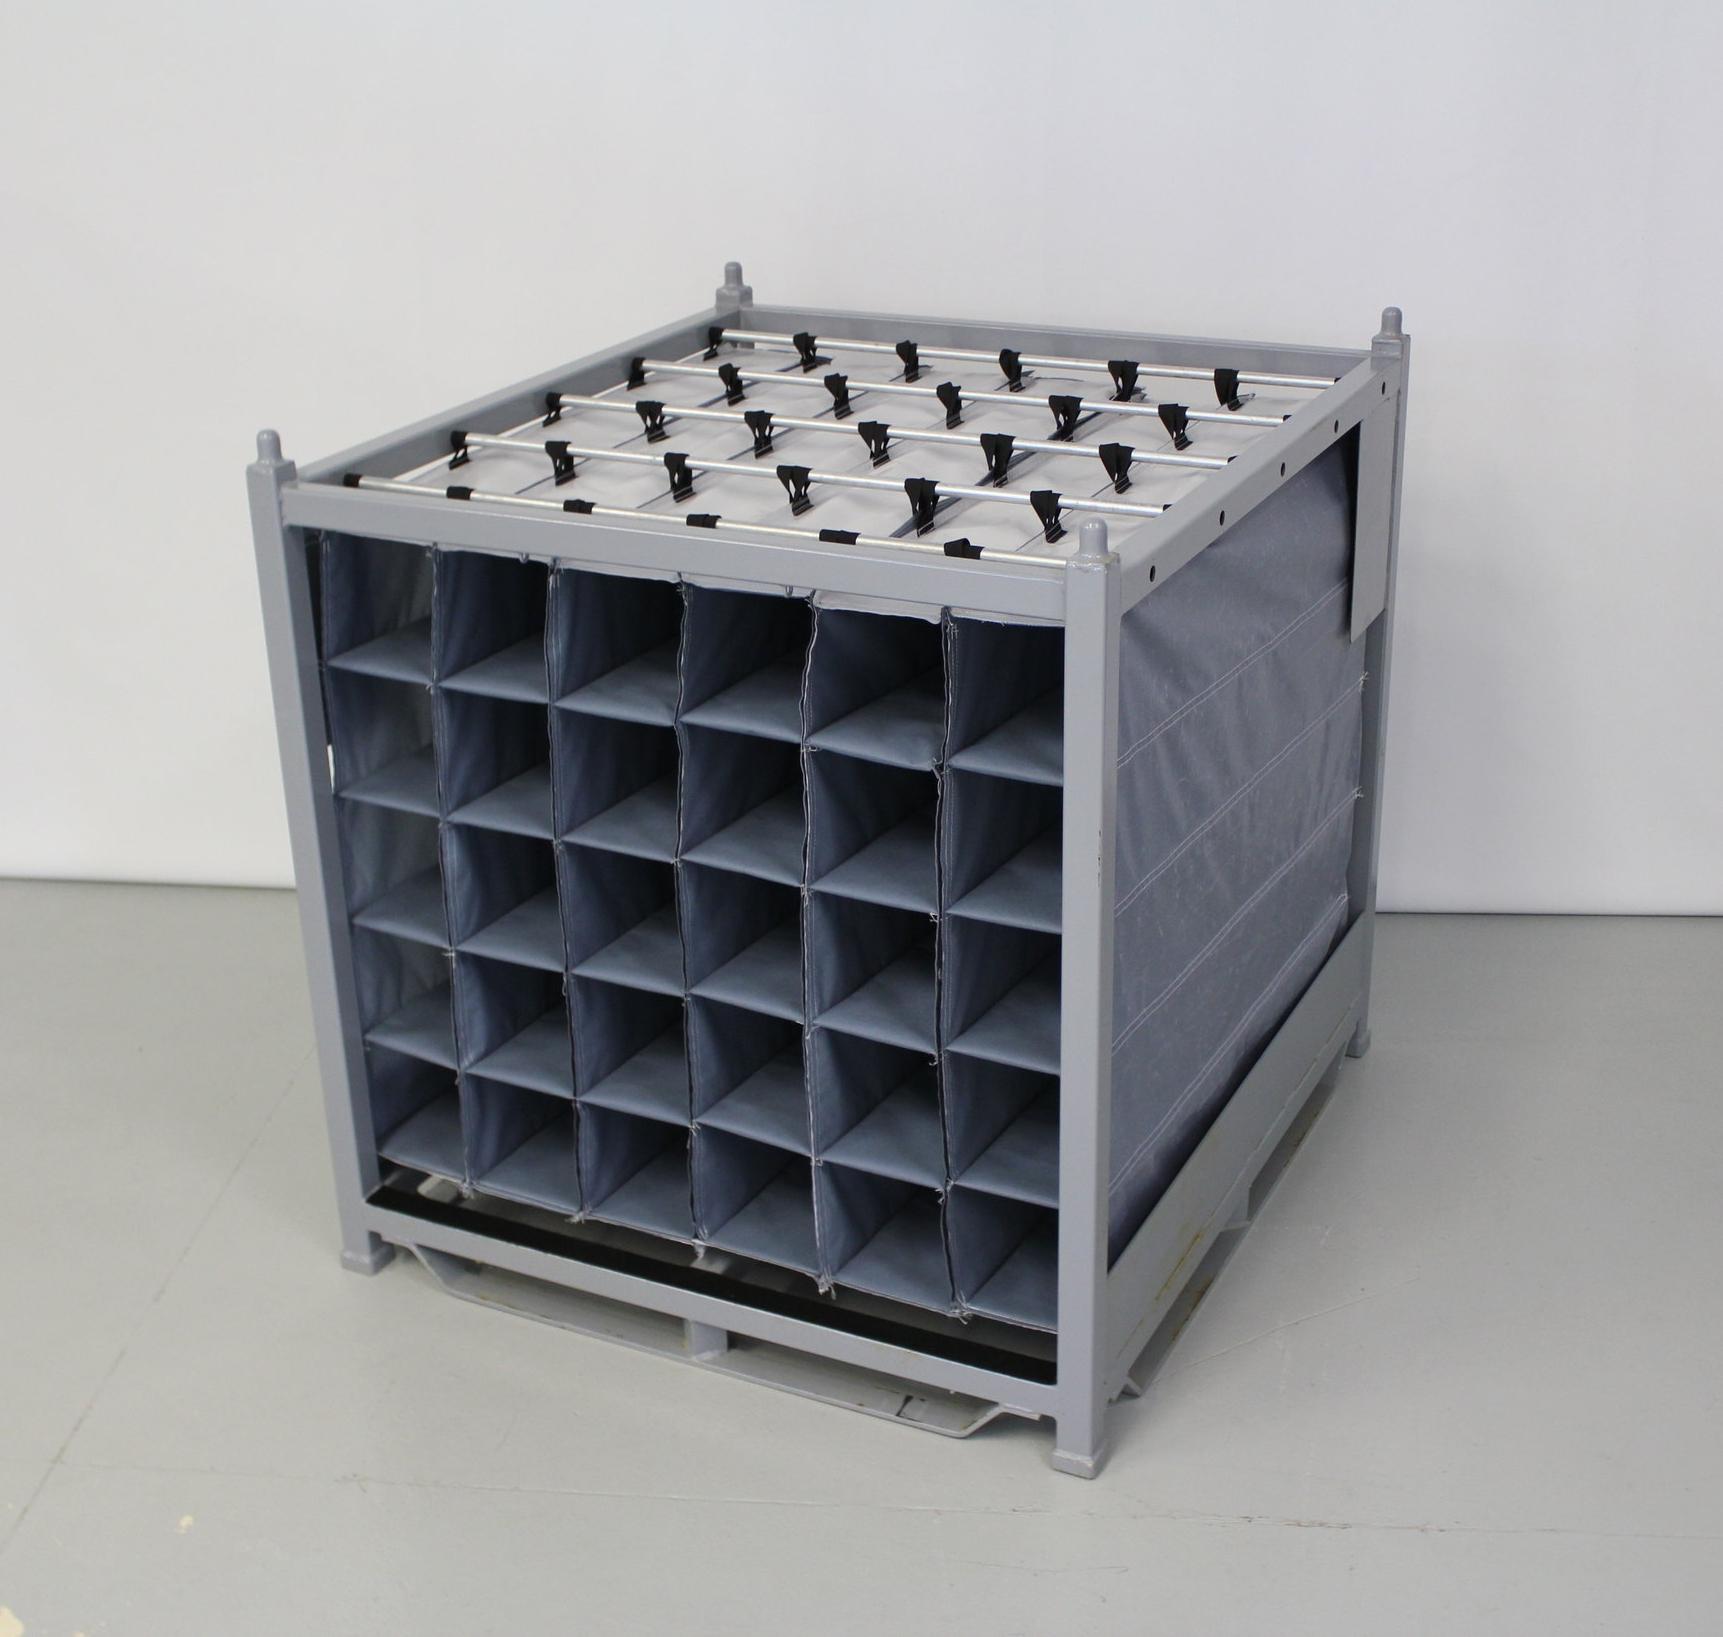 returnable-fabric-packaging-system-rack-026.JPG